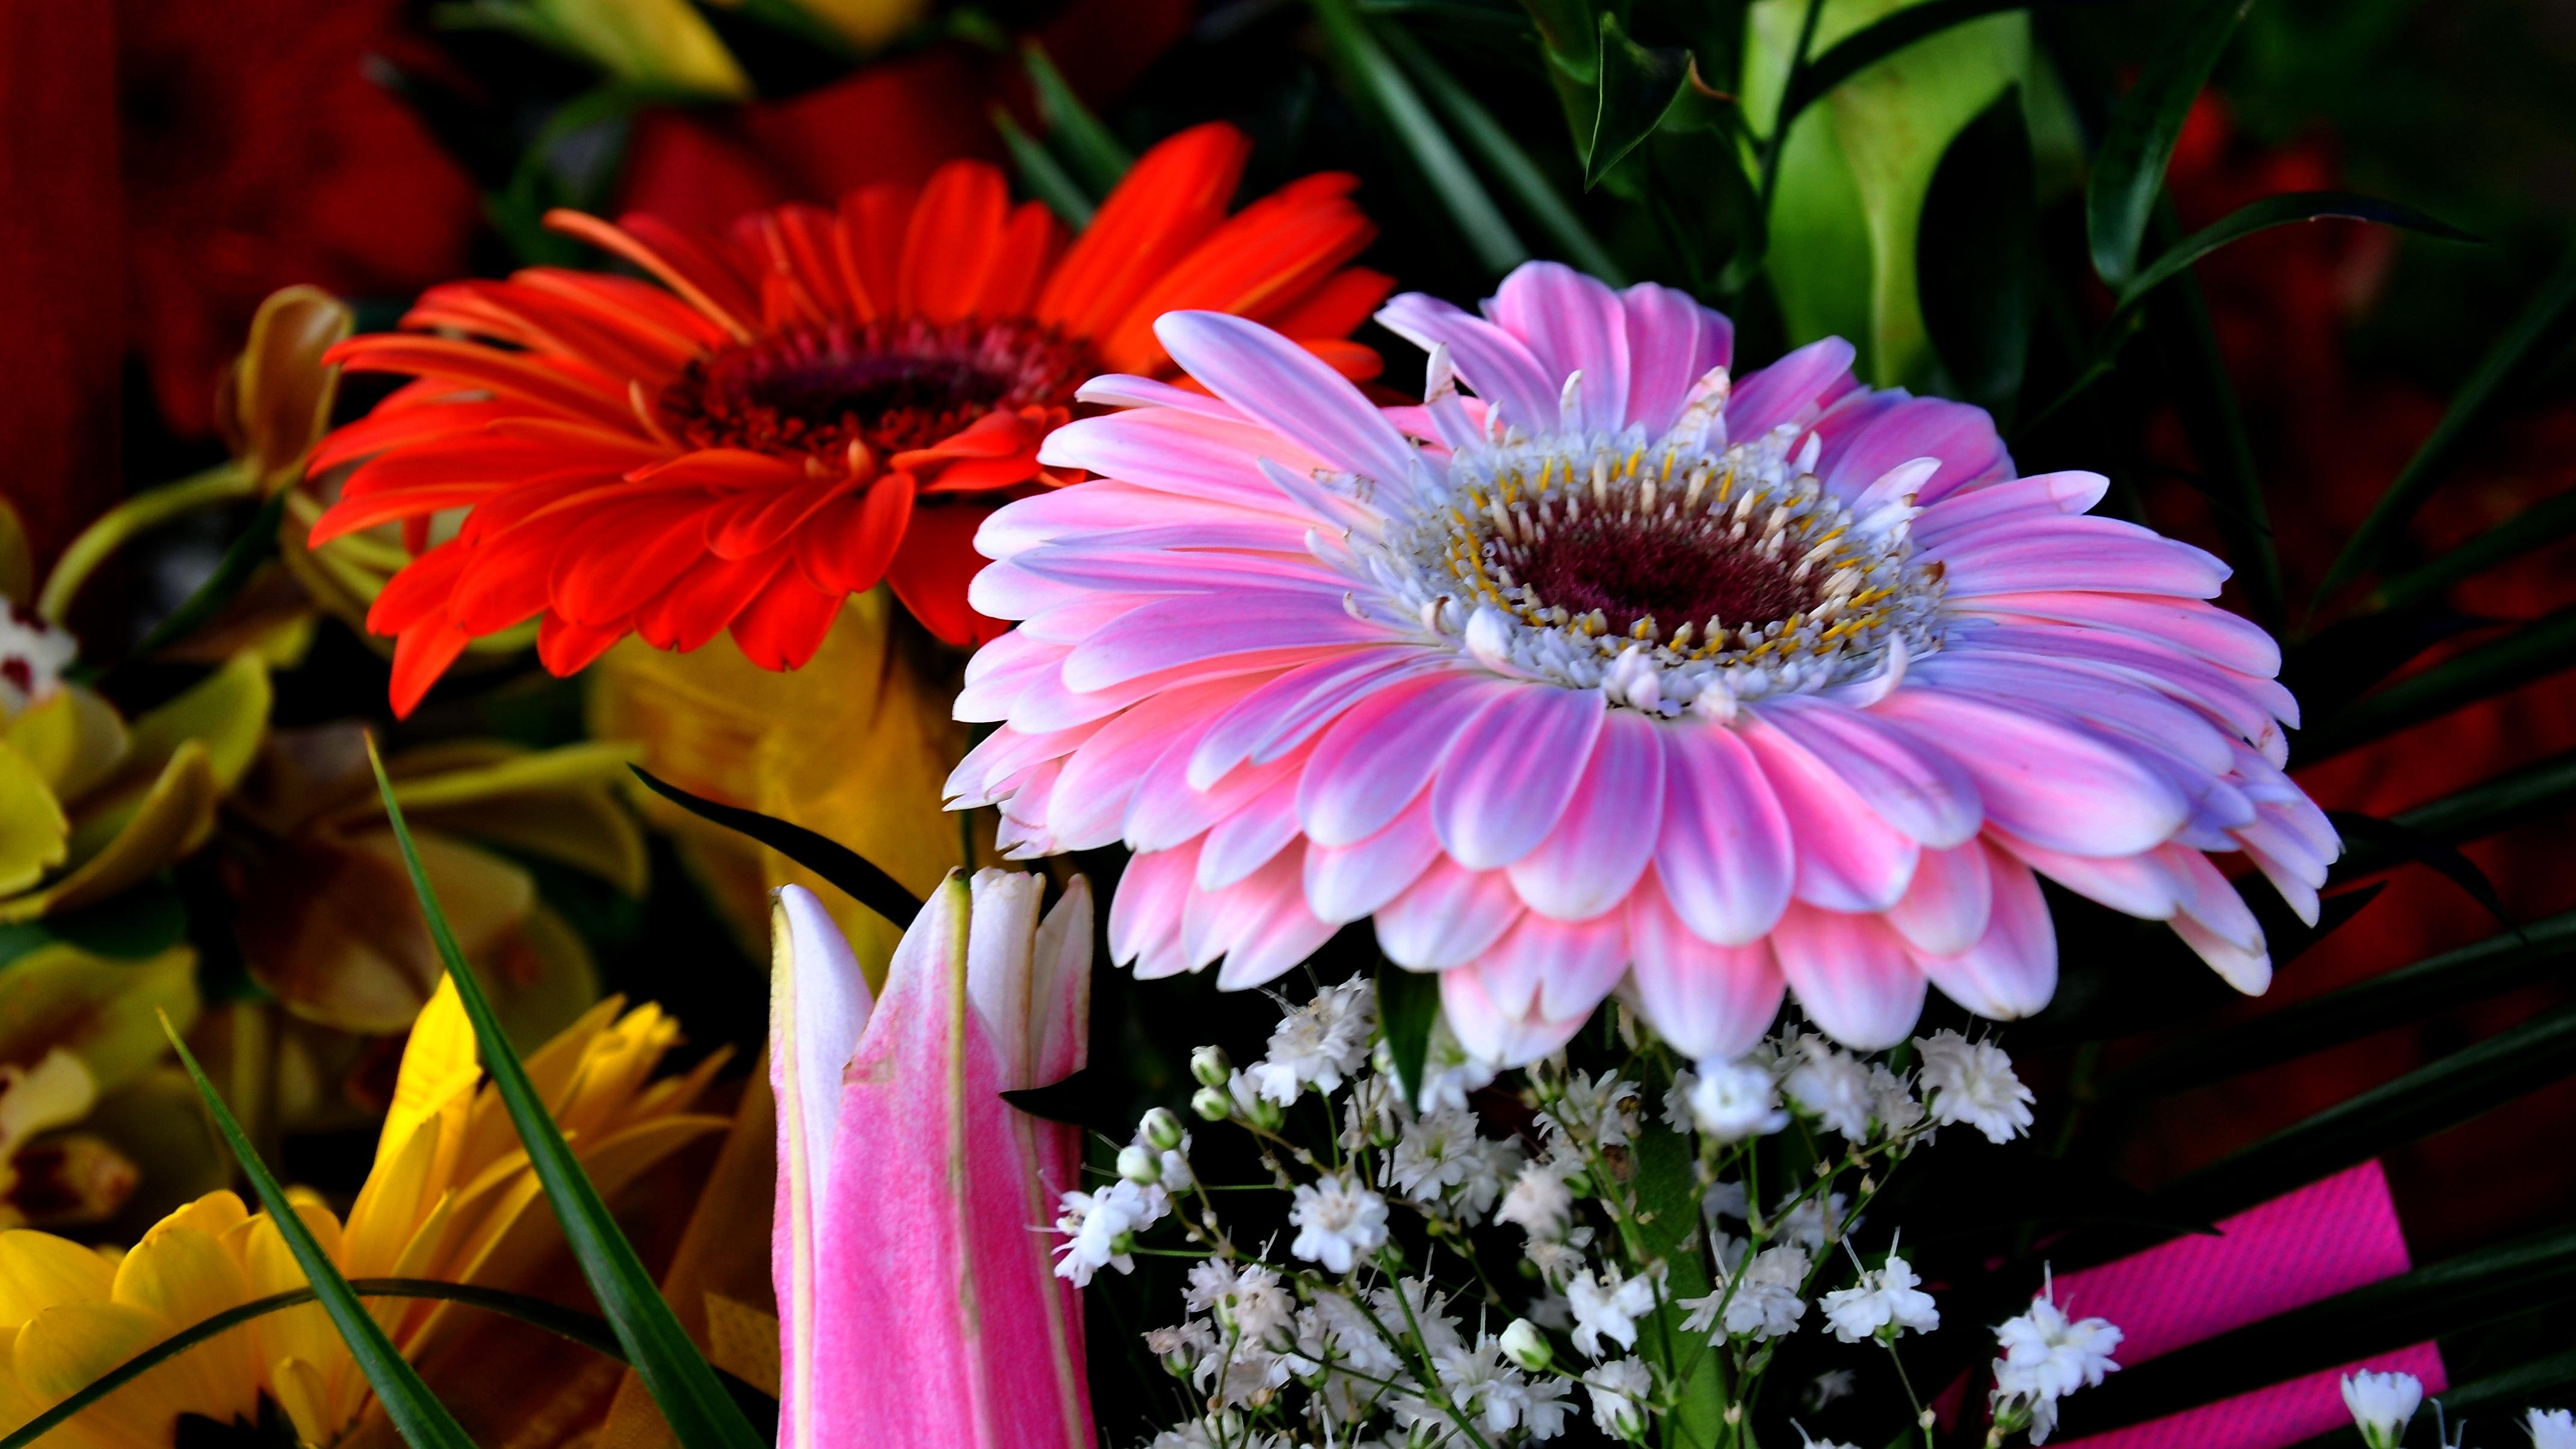 Free Images Petal Botany Pink Flora Cut Flower Gerbera